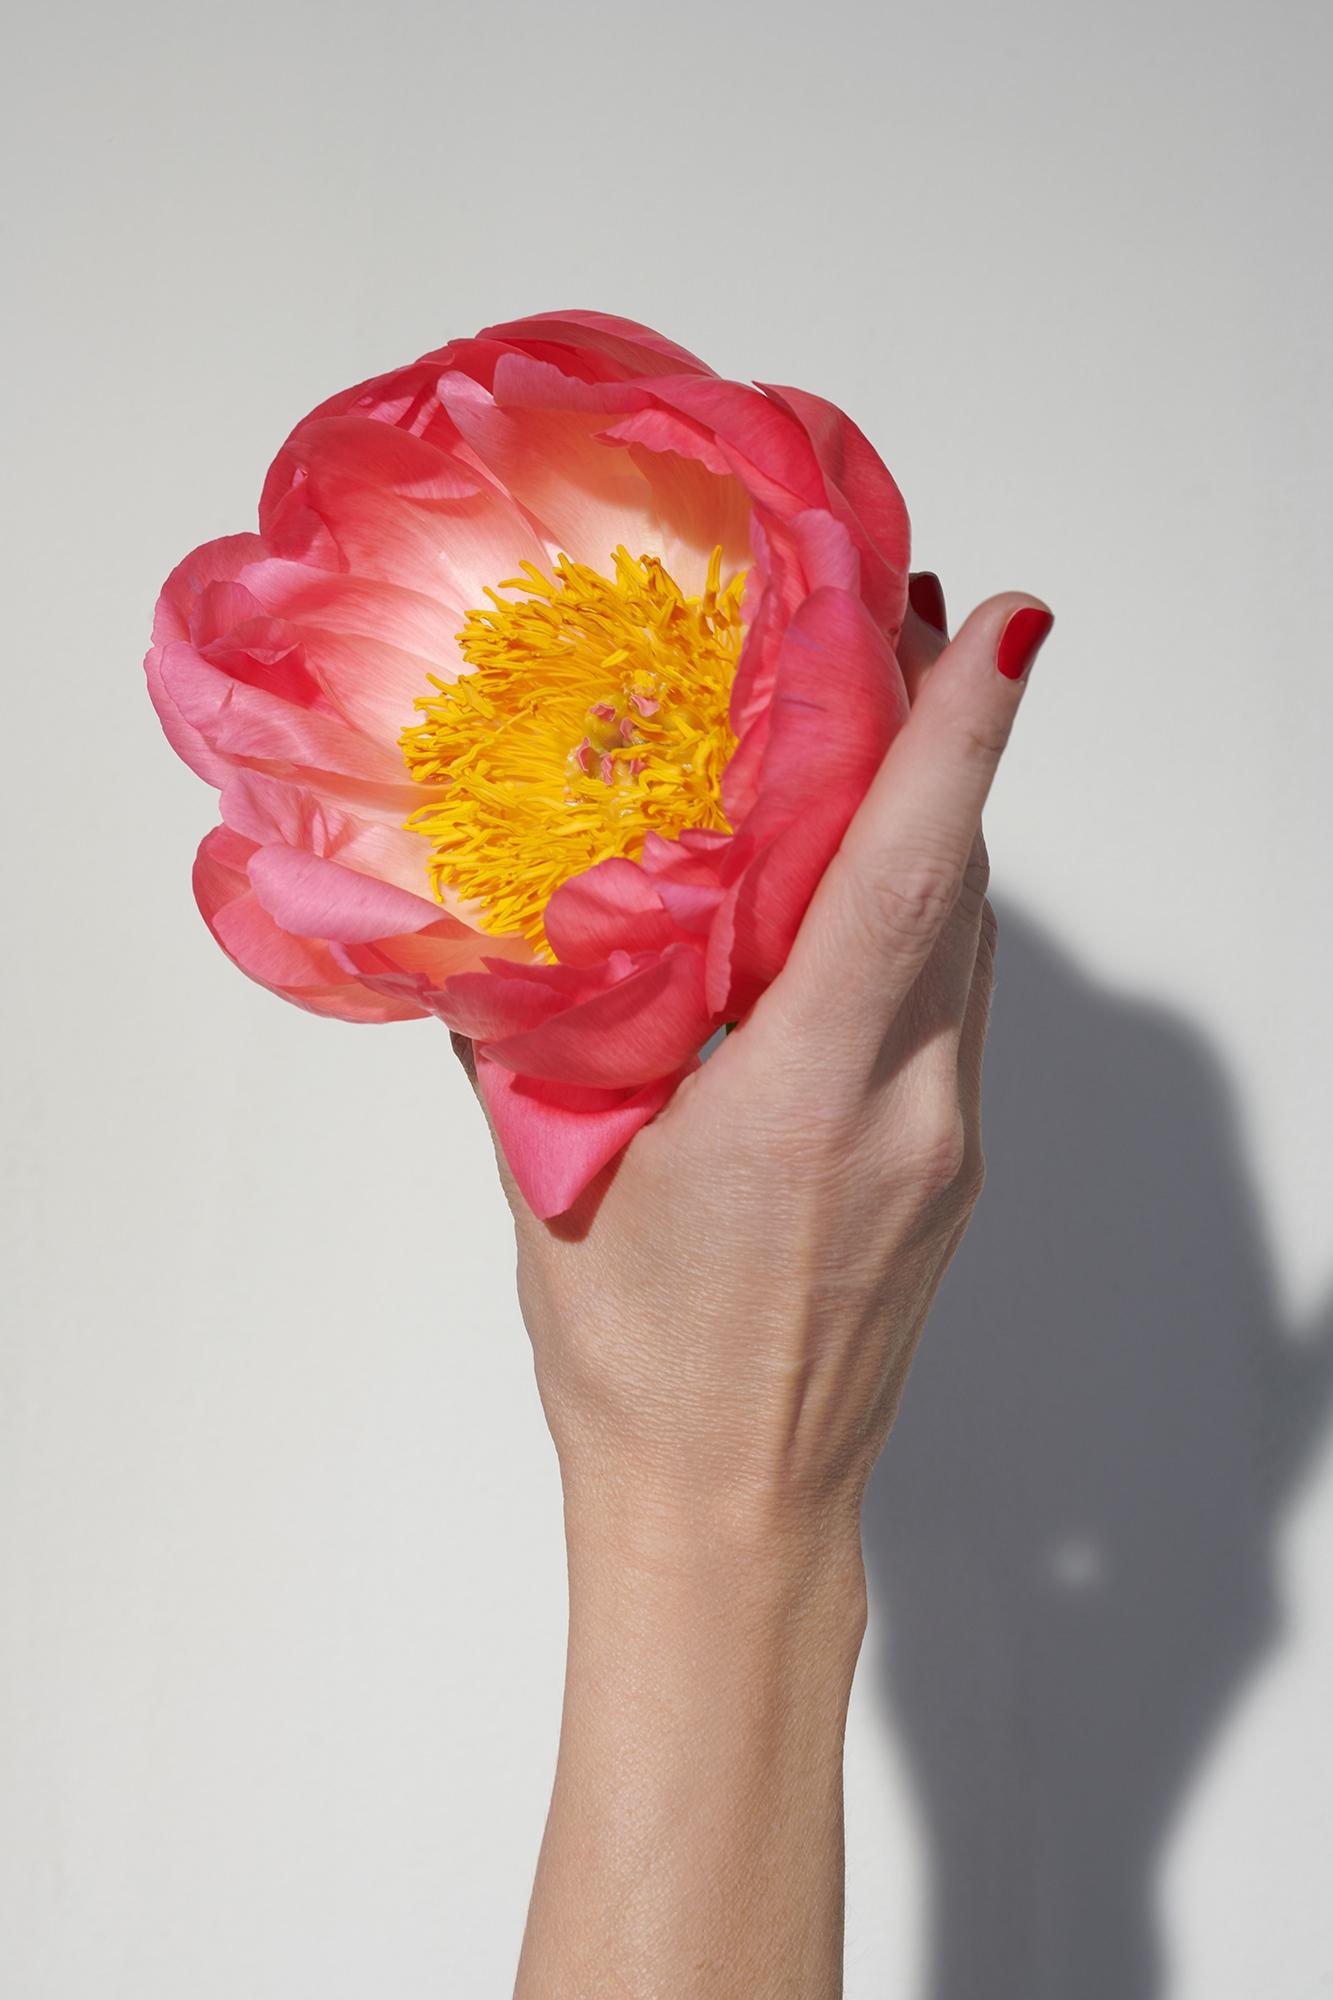 Sonja_Mueller_Flower